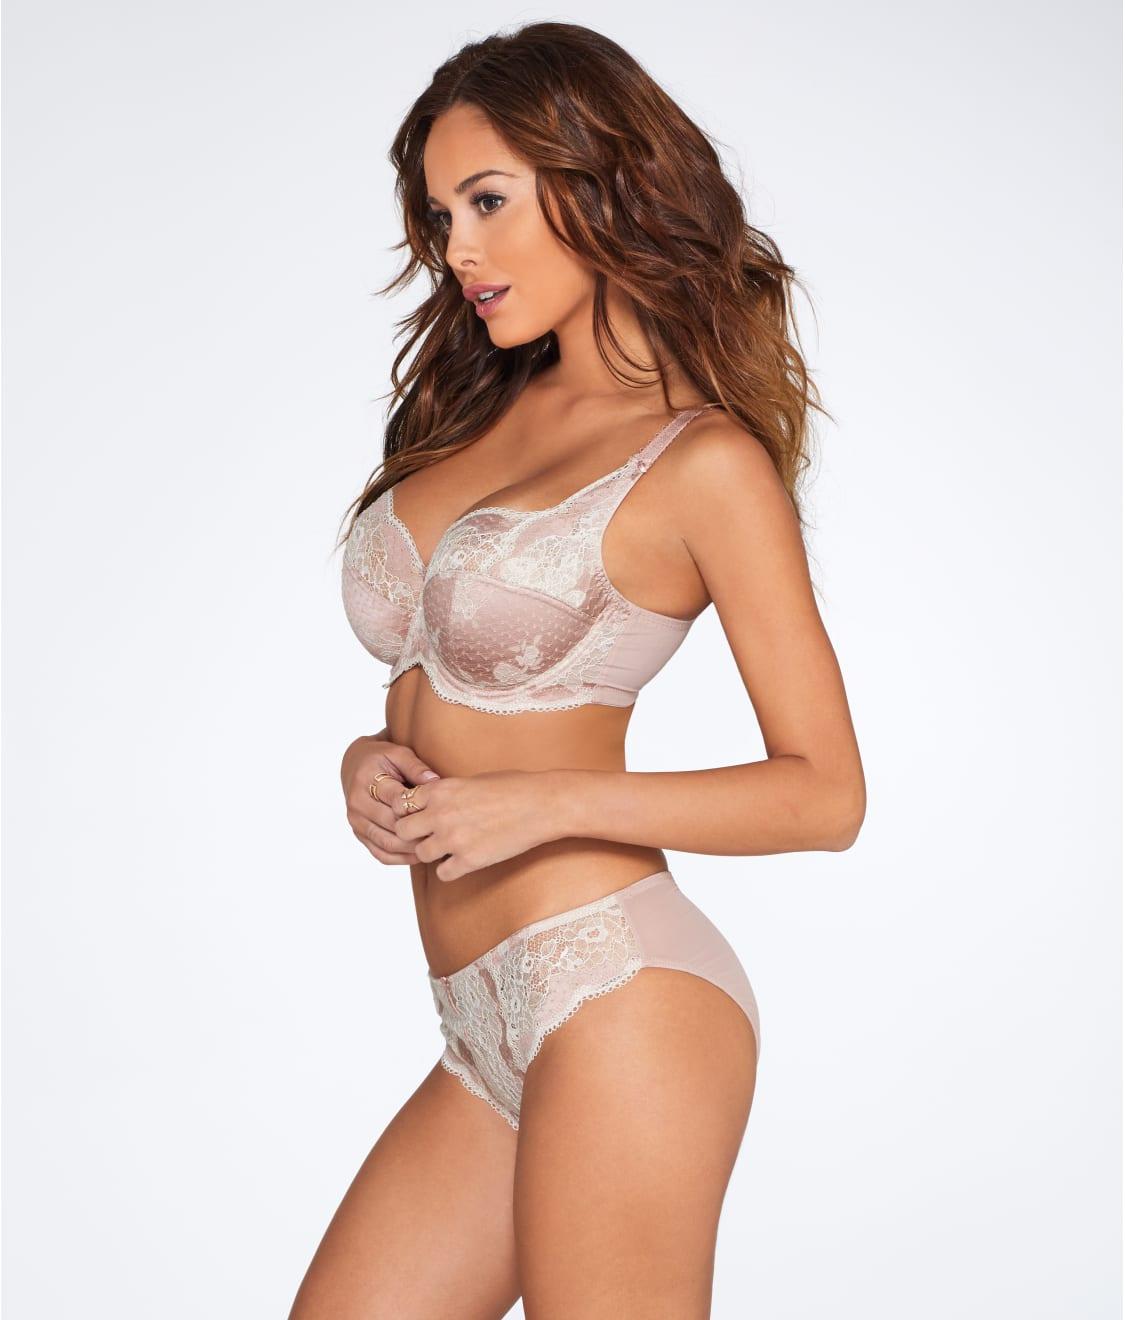 Bikini Clara Rene nude (98 photo), Topless, Fappening, Selfie, butt 2018